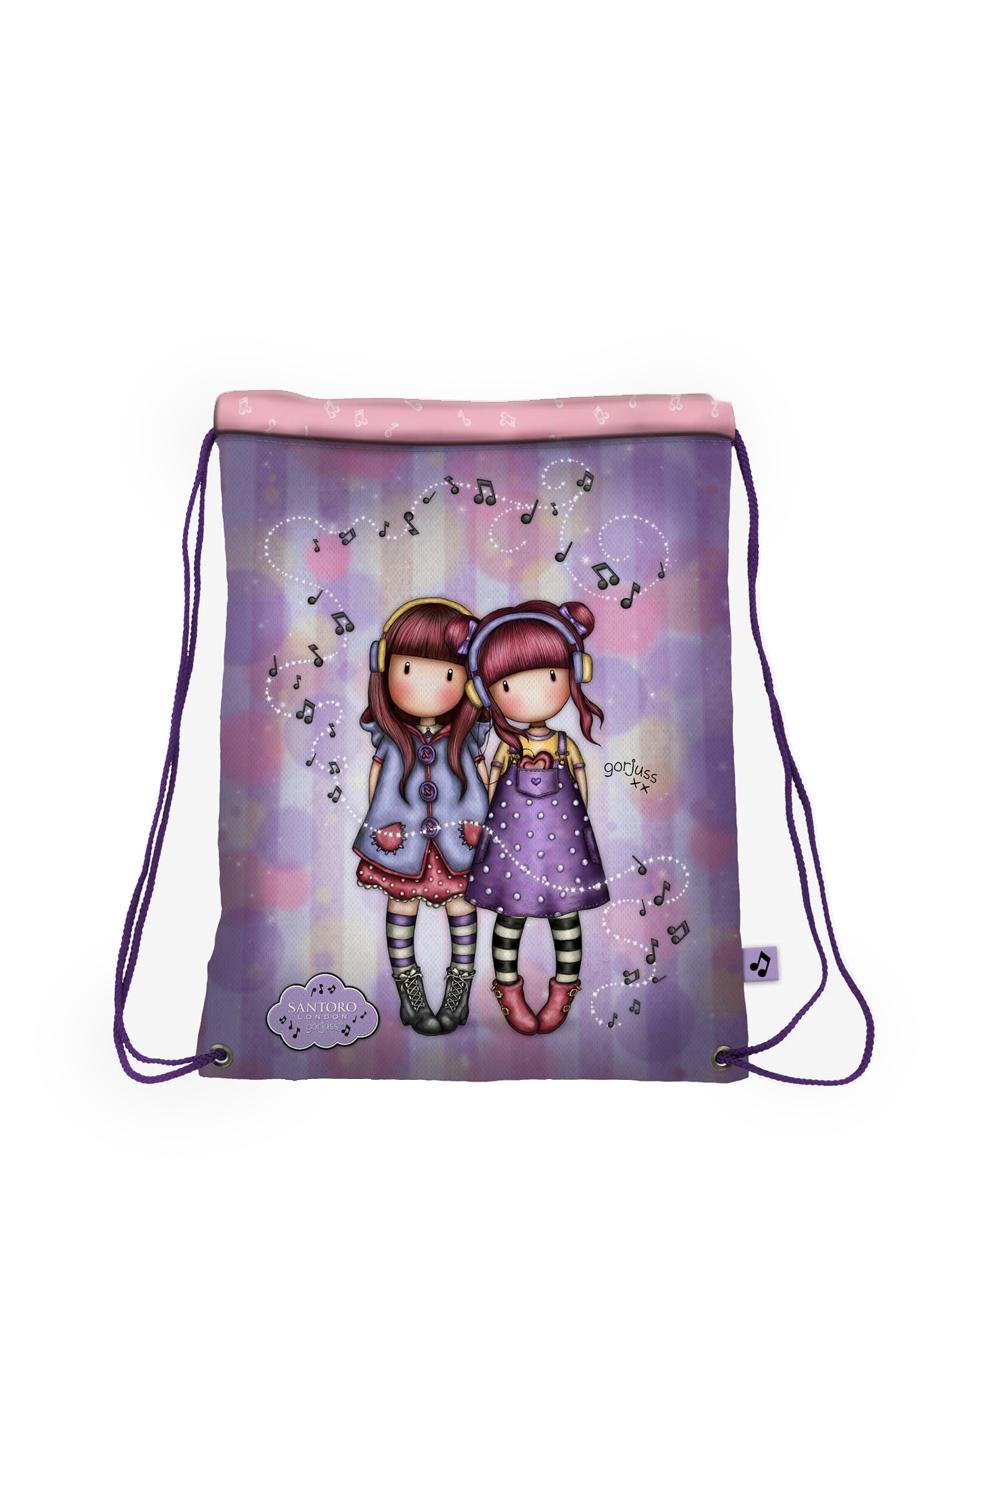 Santoro vijolična zatezna vrečka z vrvico Gorjuss The Duet